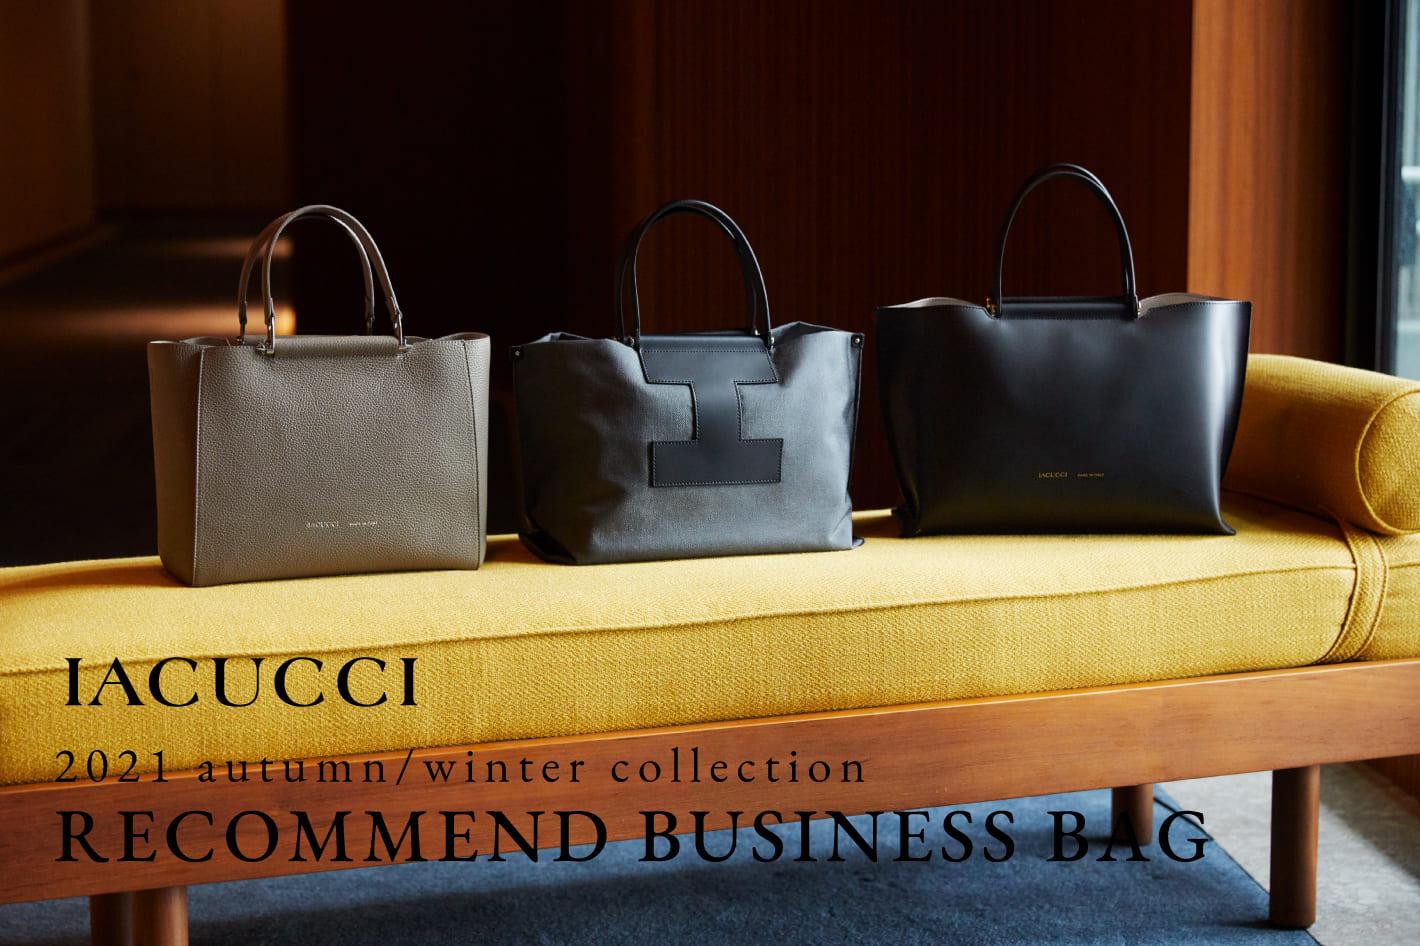 IACUCCI 〈PICK UP〉お仕事スタイルにおすすめの名品バッグ